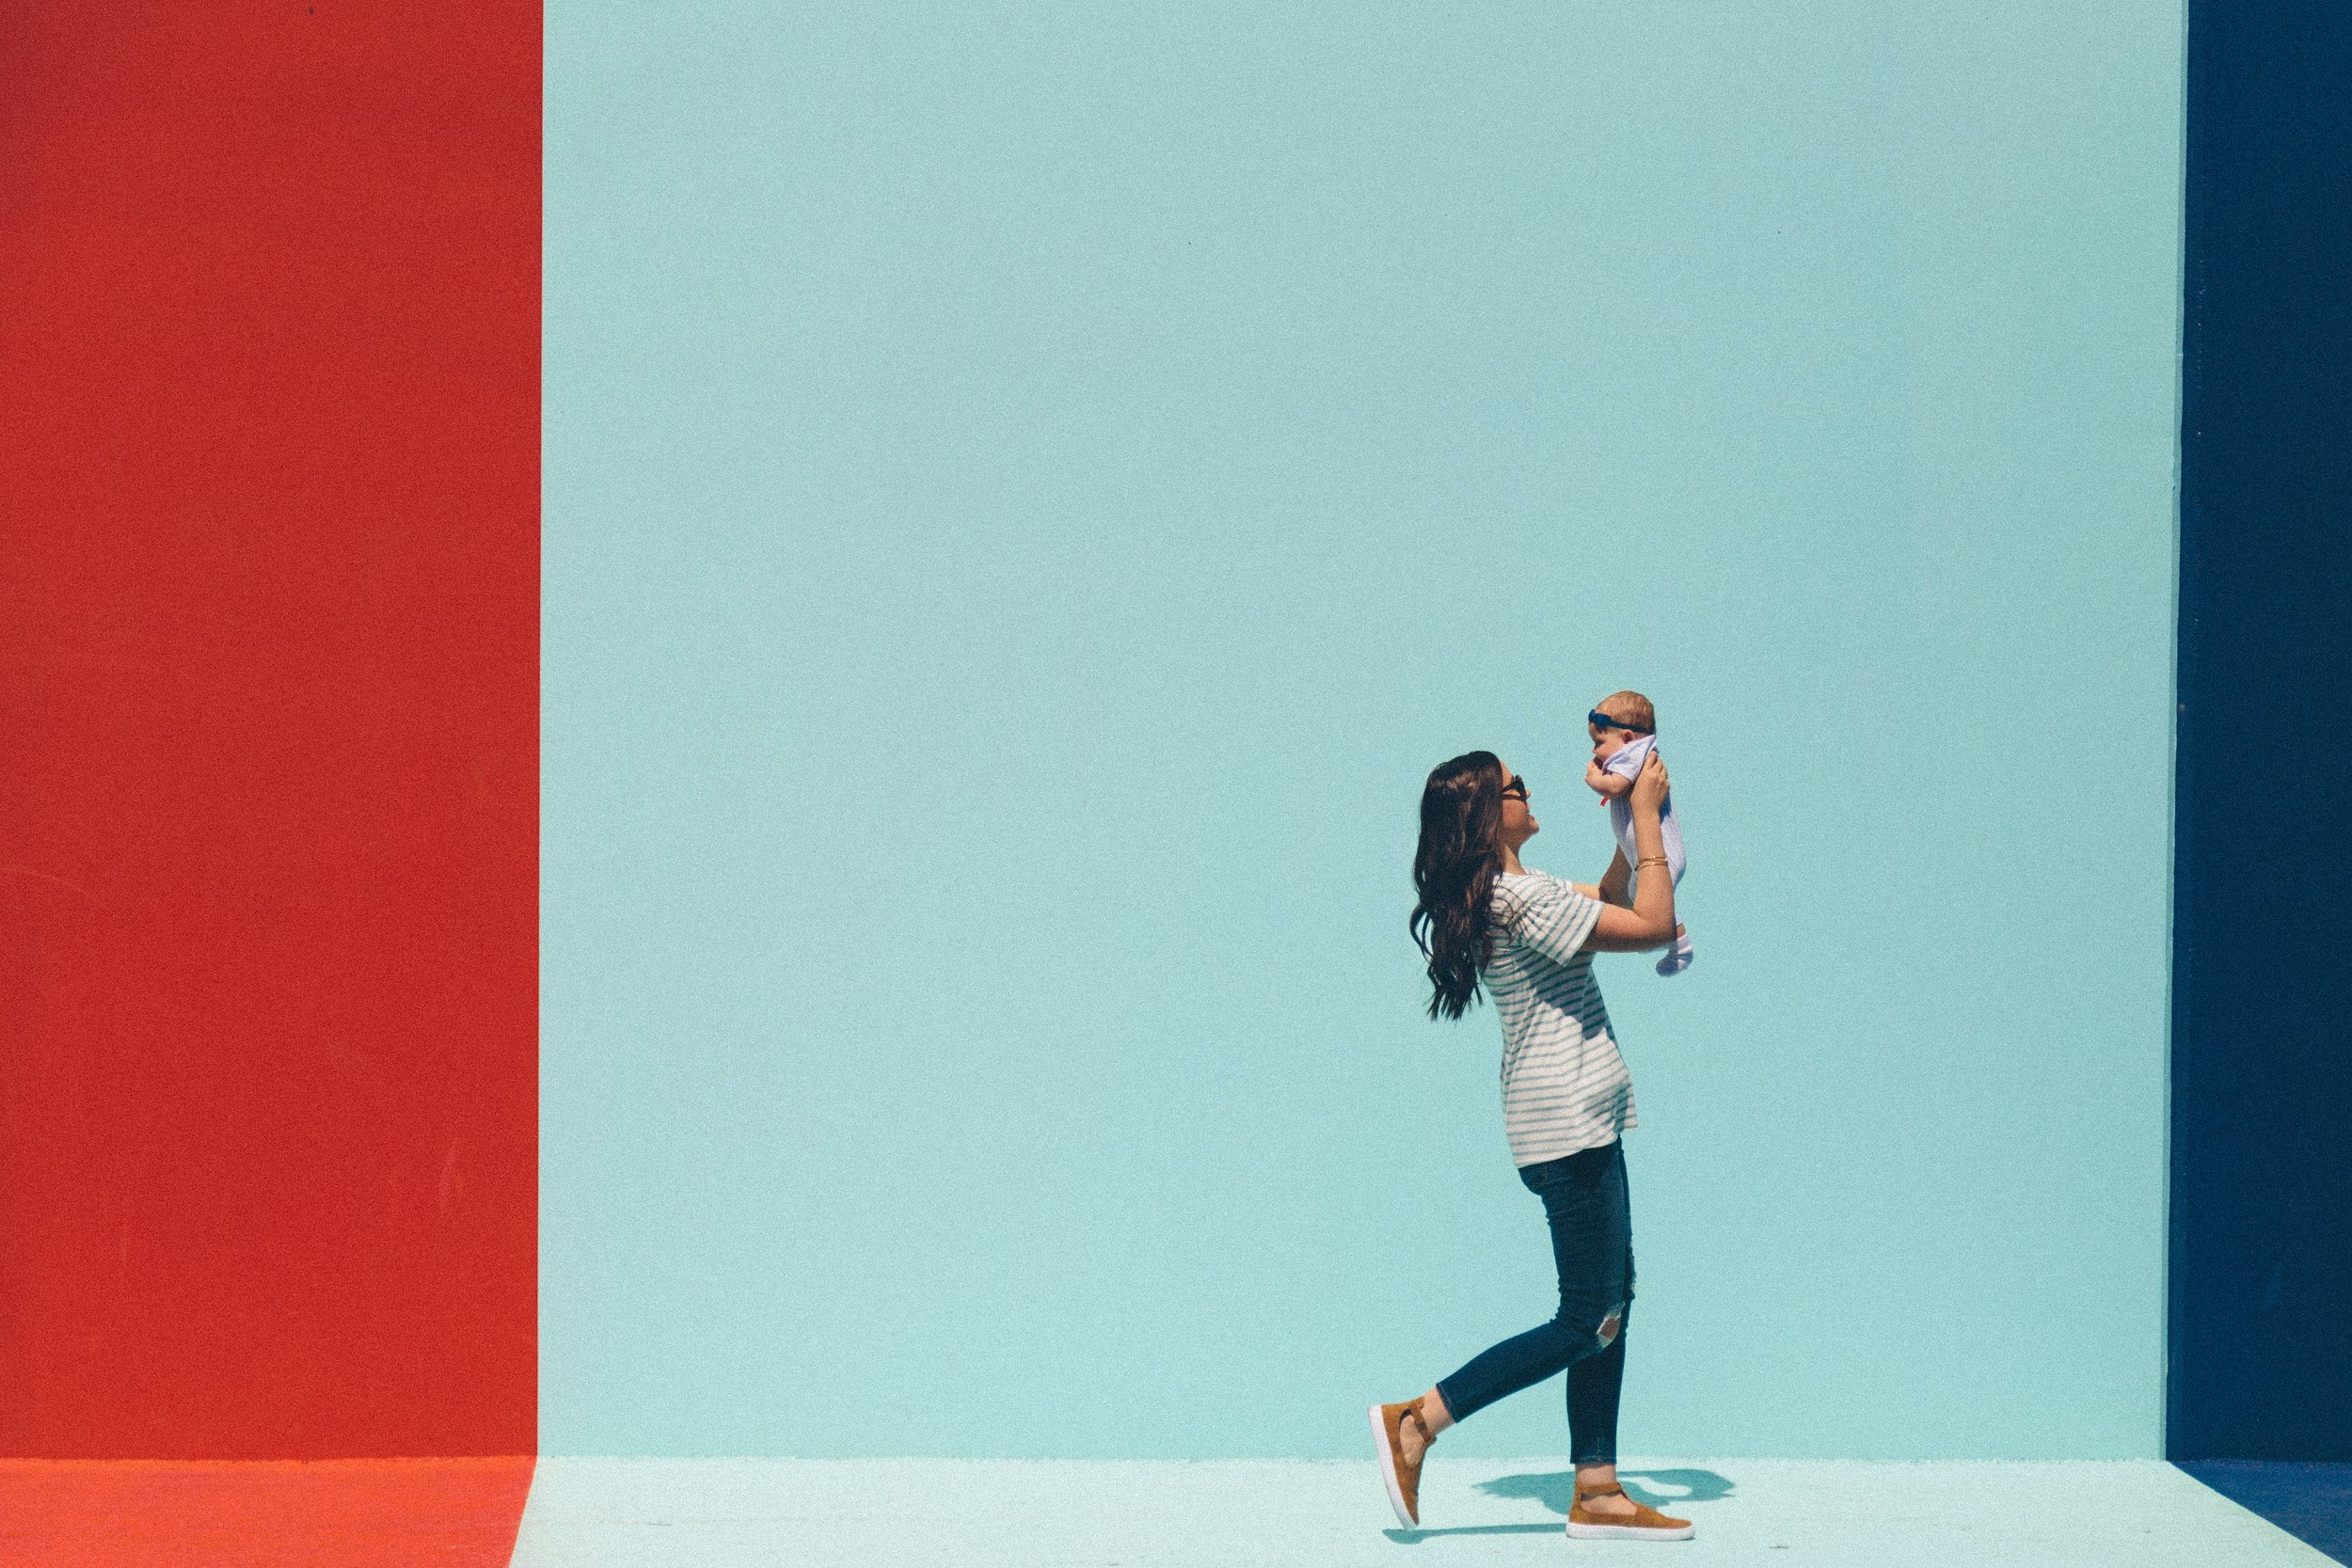 SIX KEYS FOR PARENTING. -